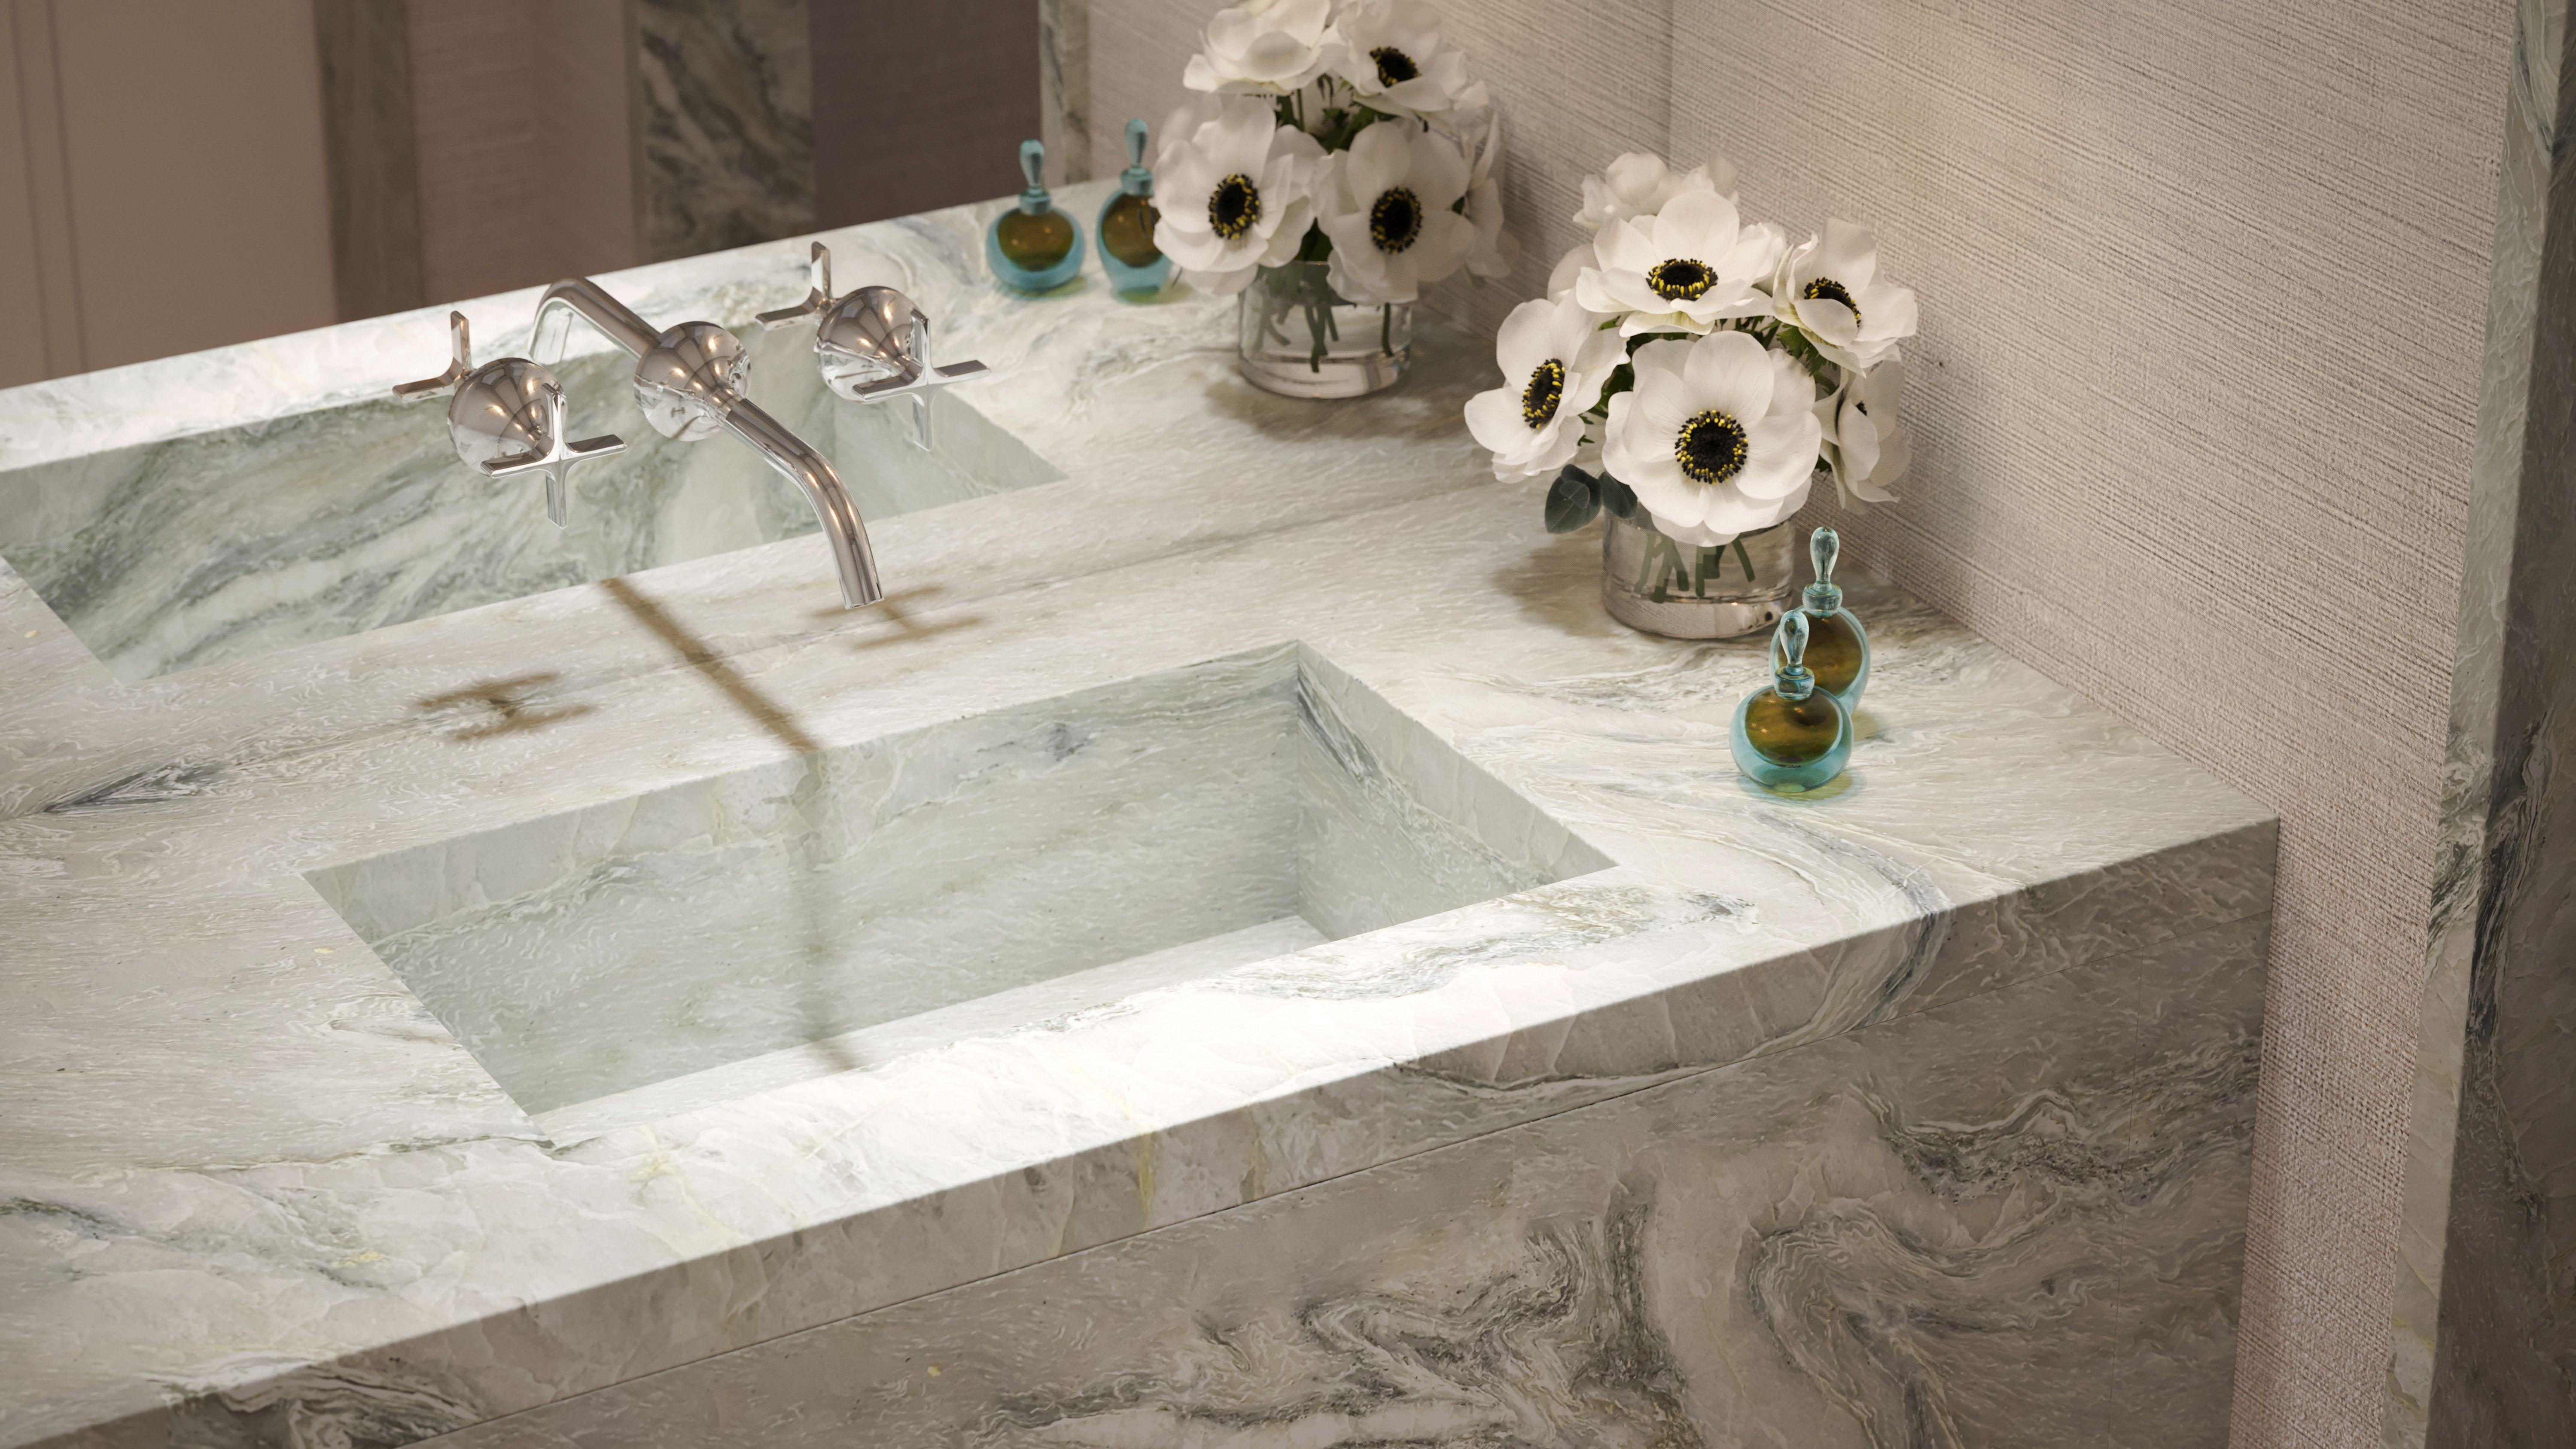 Powder rooms feature vanities clad in slabs of Maya Quartzite with custom integral sinks and Dornbracht Vaia plumbing fittings in polished nickel